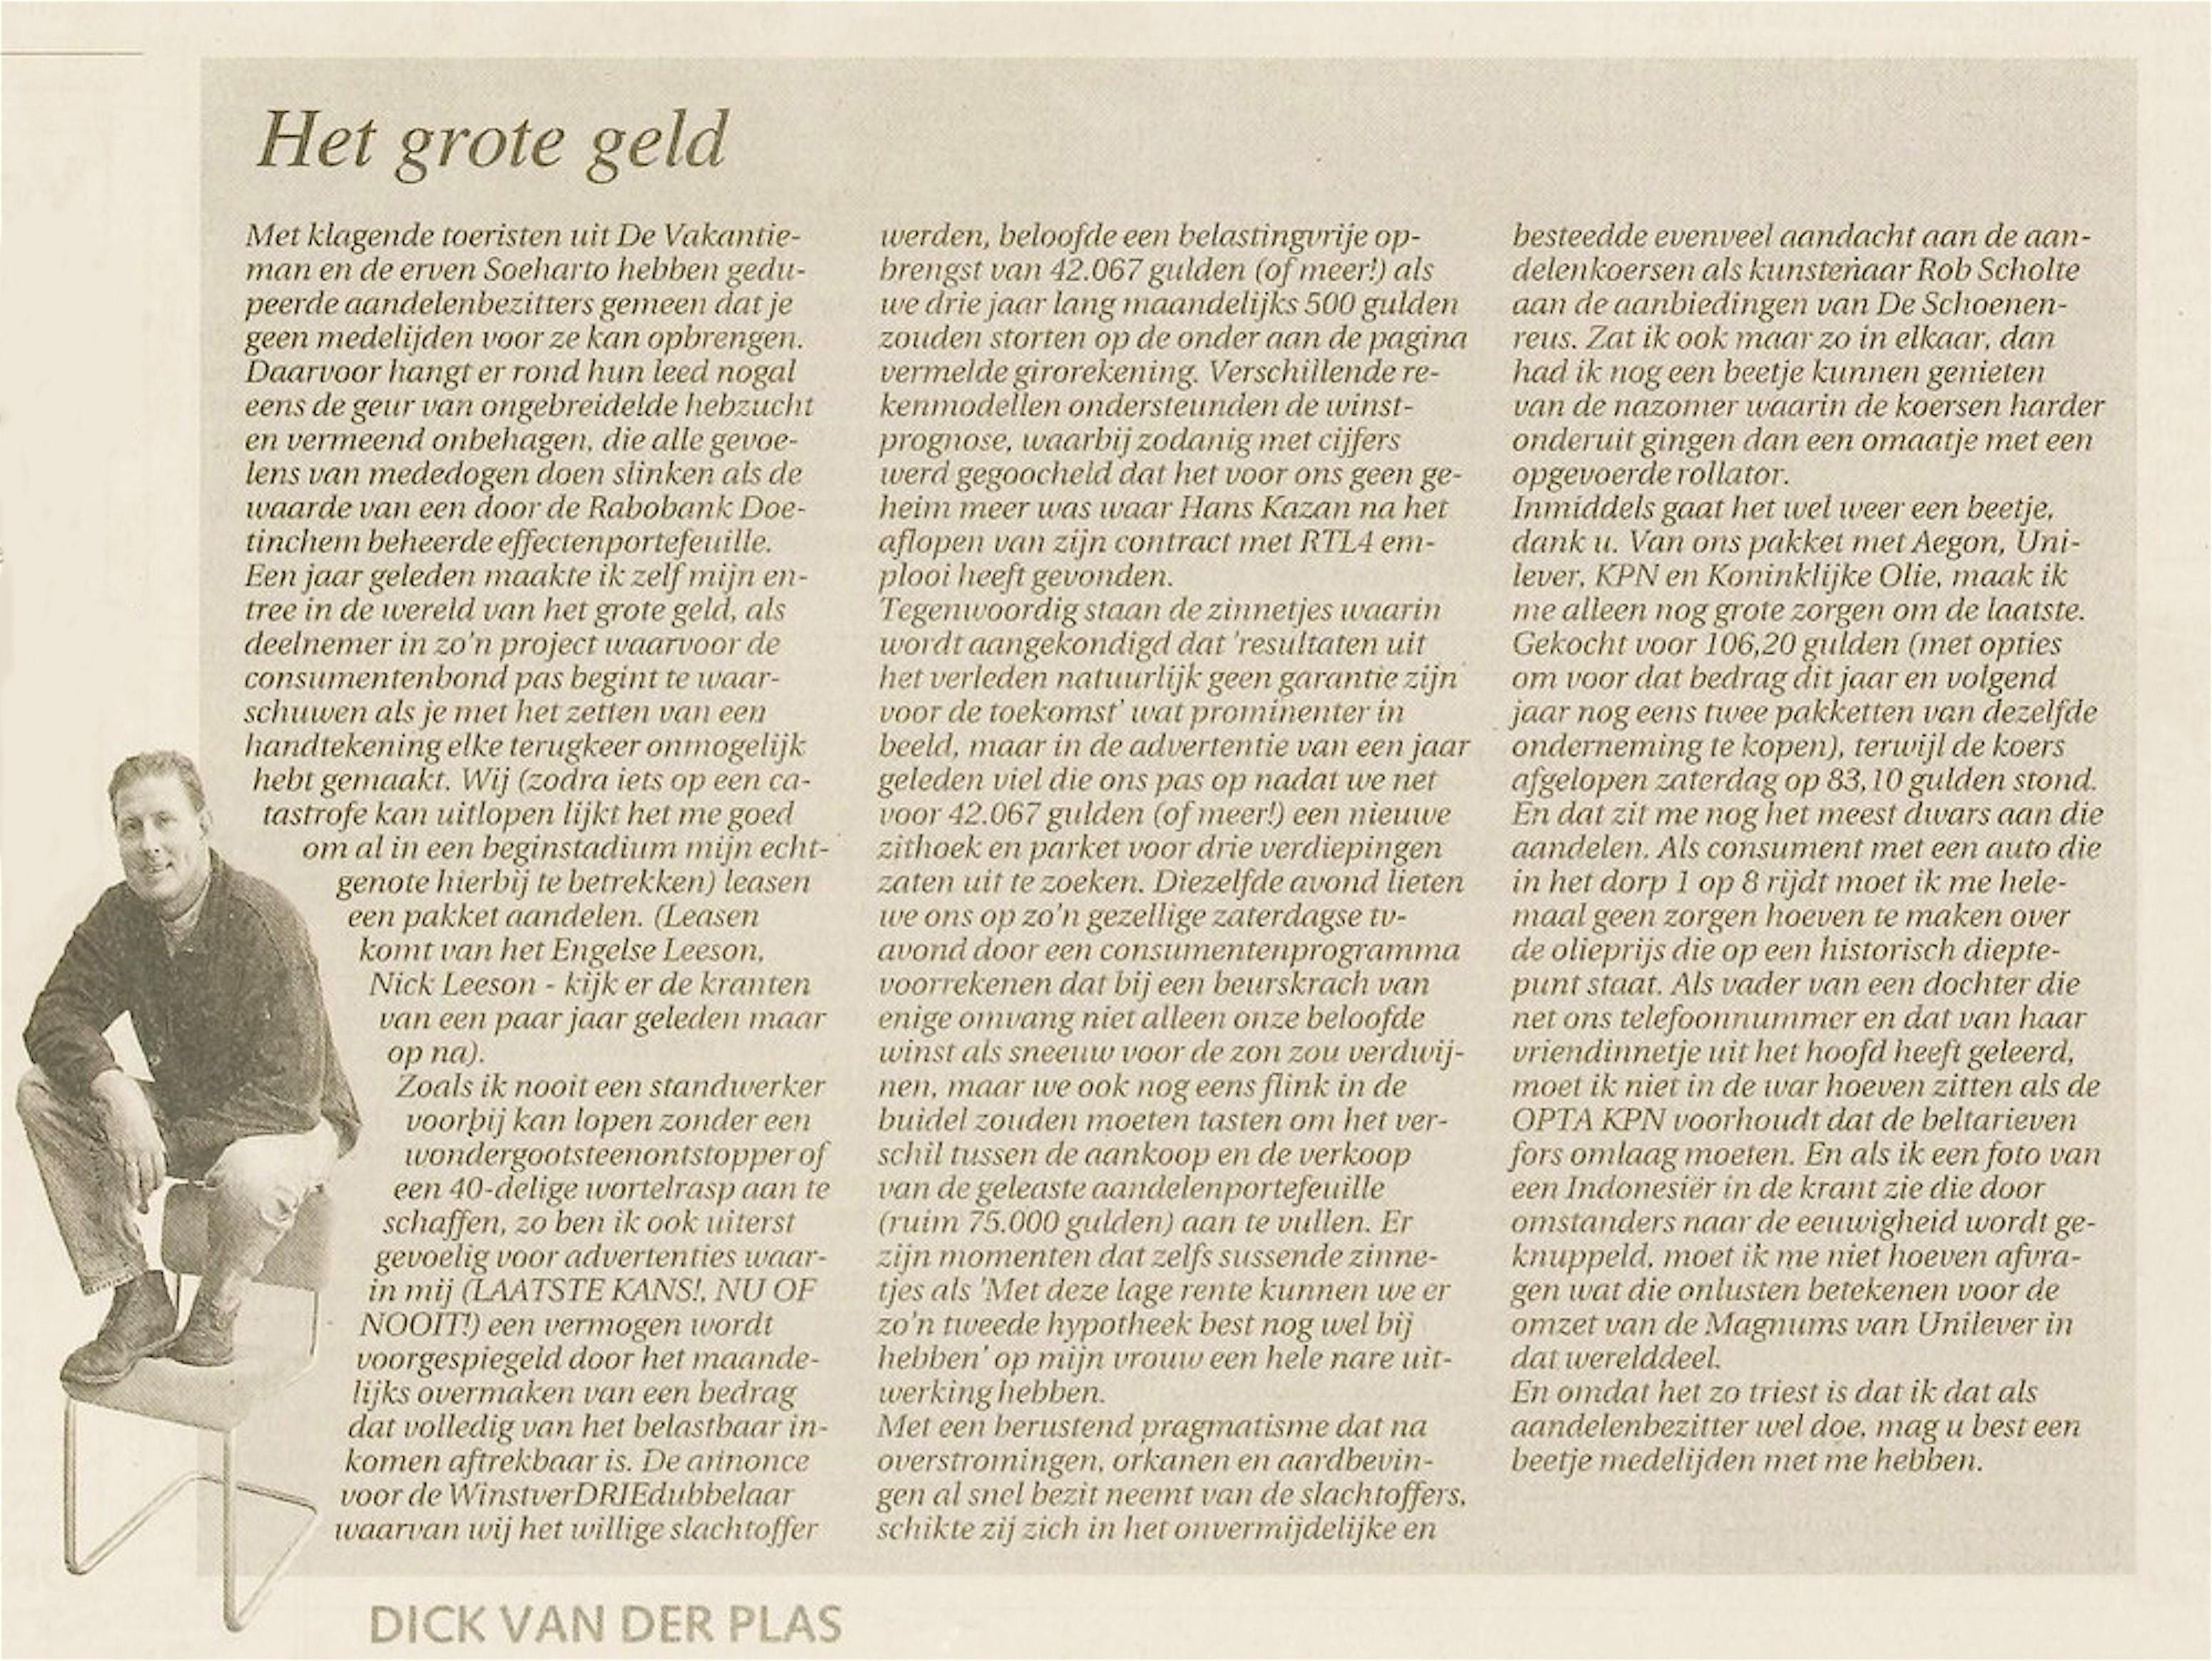 Leidsch Dagblad | 7 december 1998 | pagina 2 (2/30)